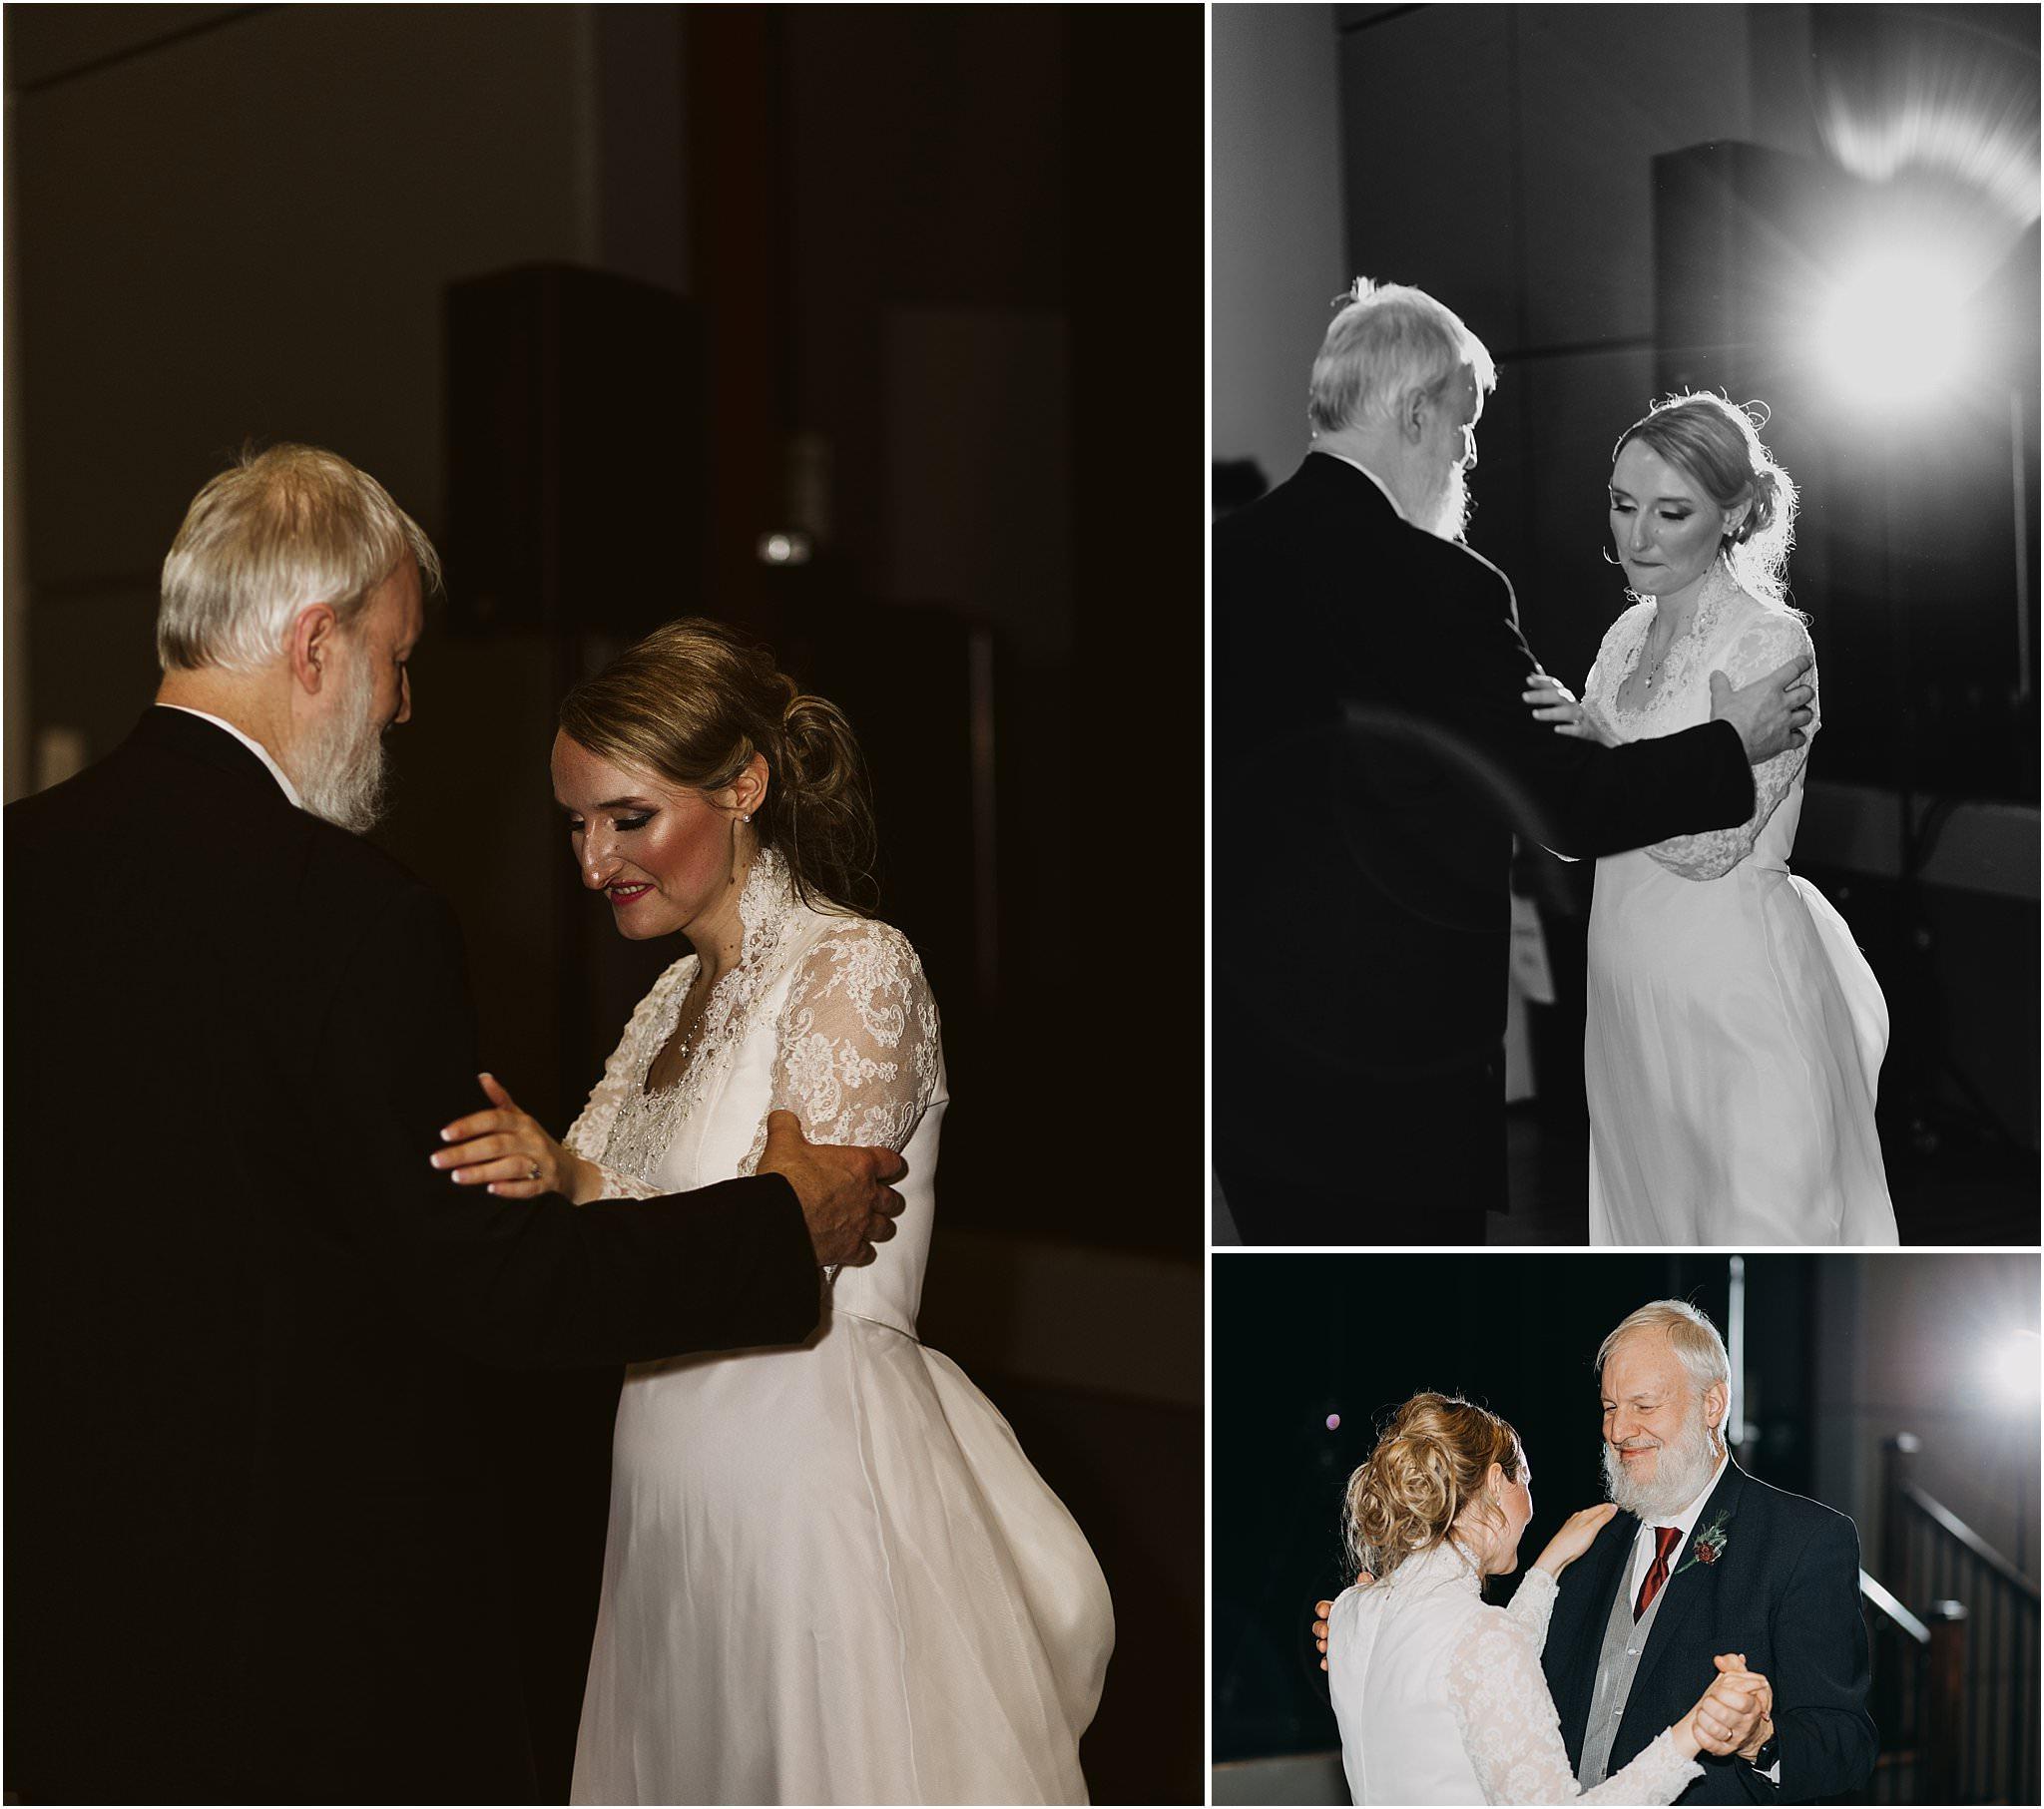 katy-robin-married-in-mukilteo-wedding46.jpg